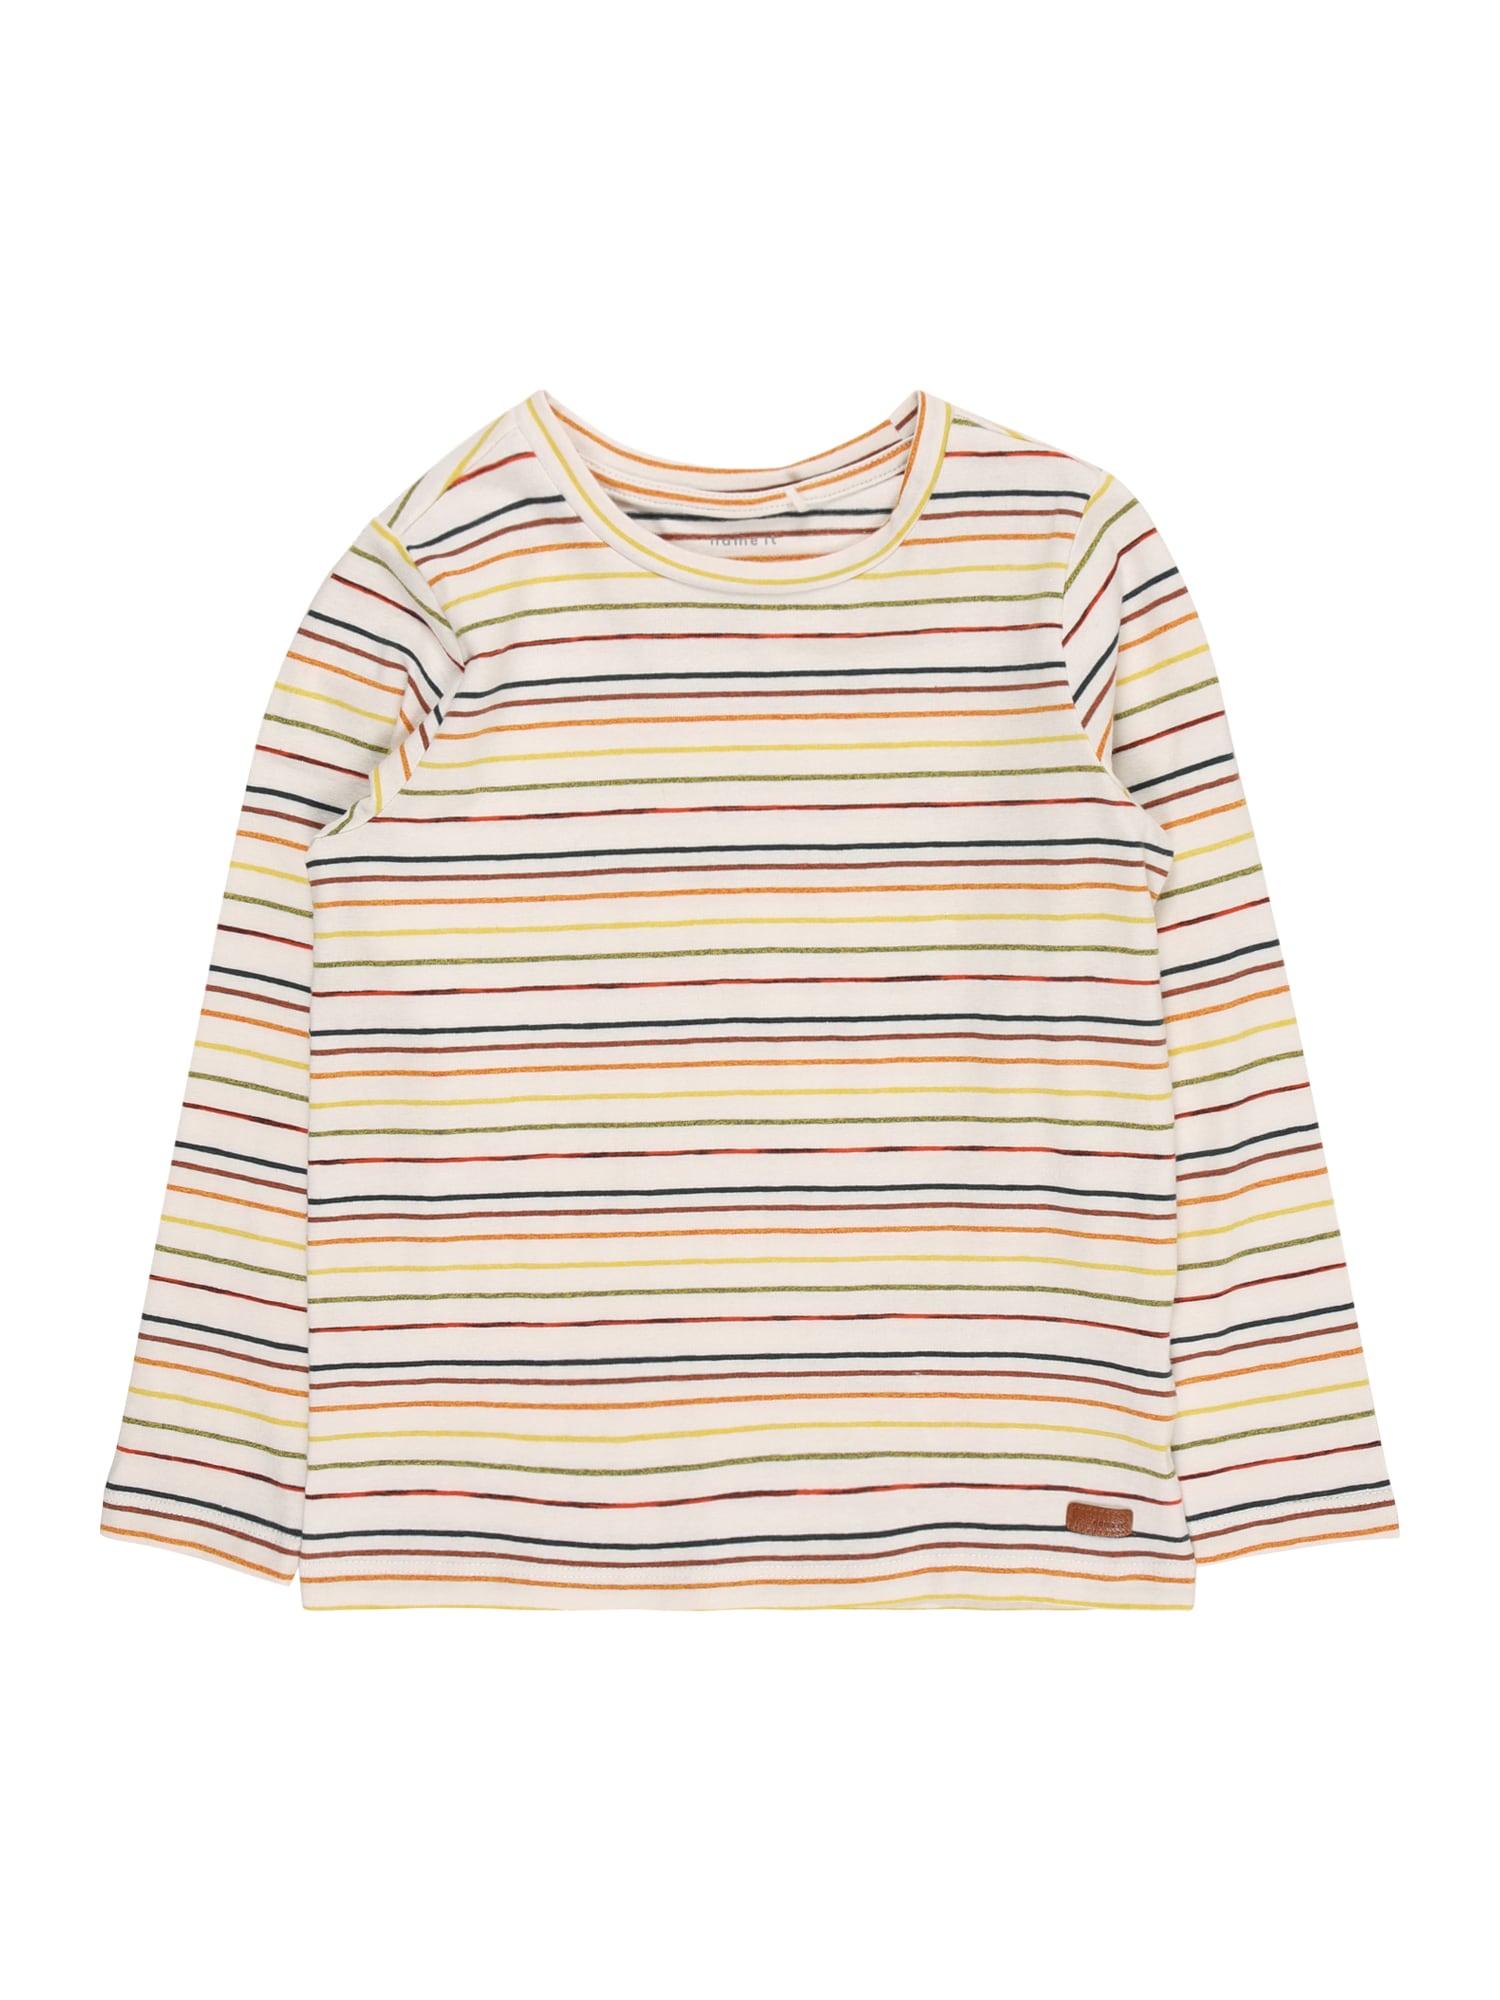 NAME IT Tričko 'SOHR'  bílý melír / mix barev